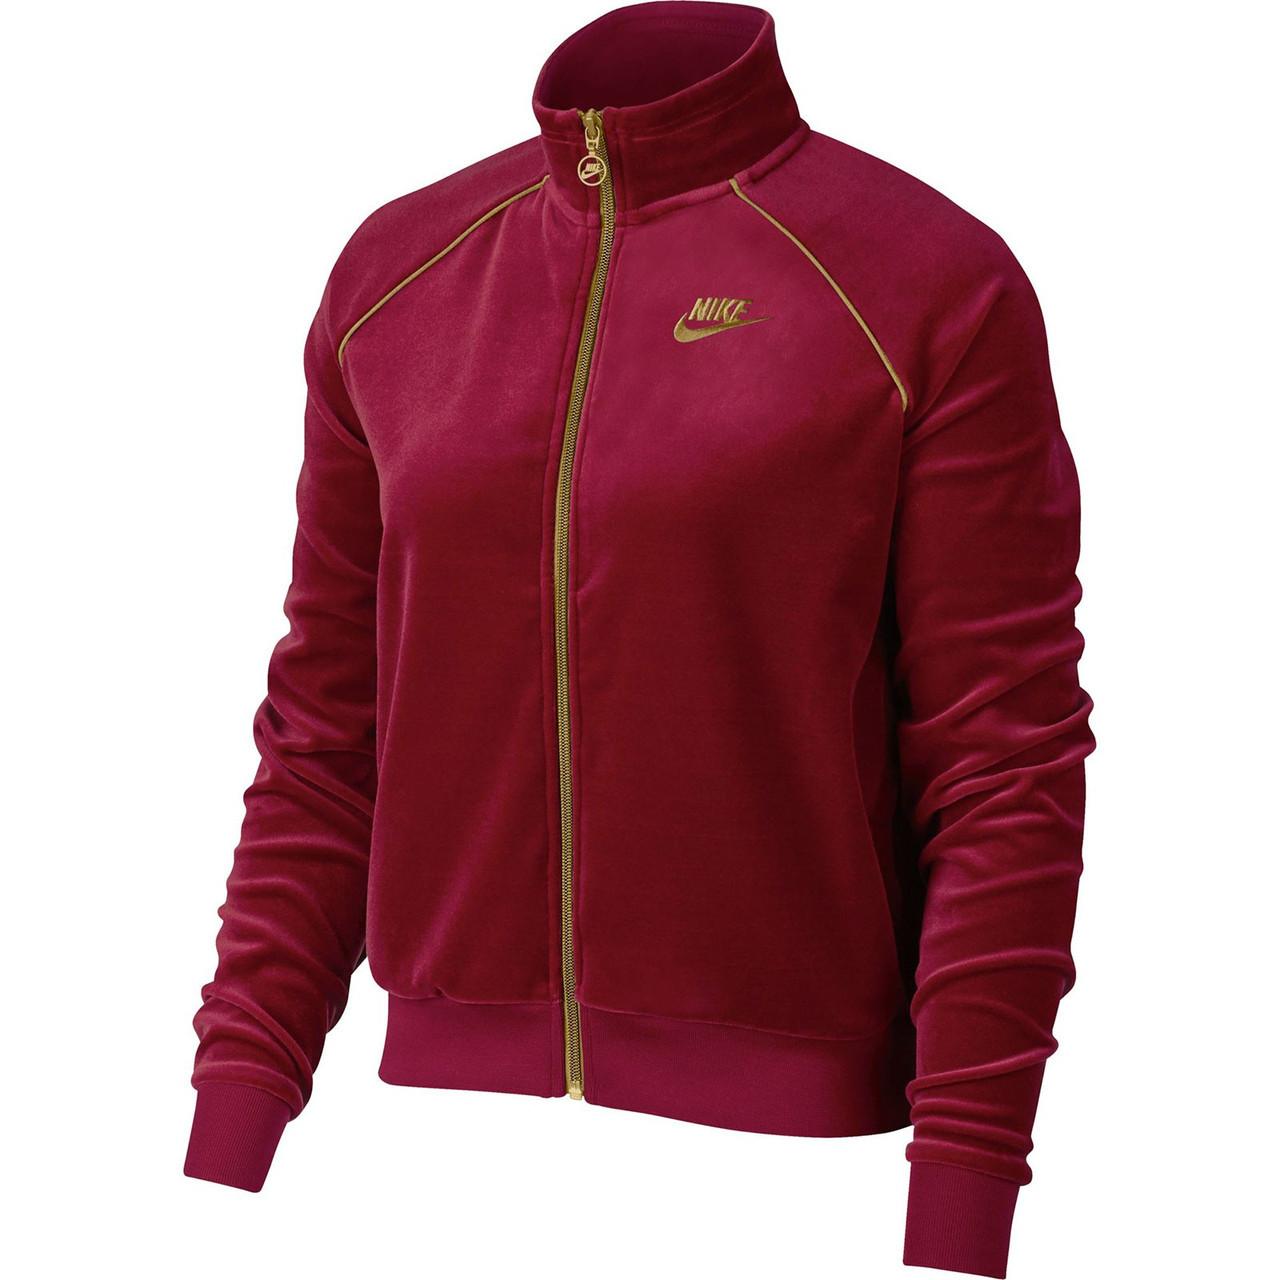 Куртки и жилетки женские W NSW TRK JKT VELOUR(02-05-08-01) S